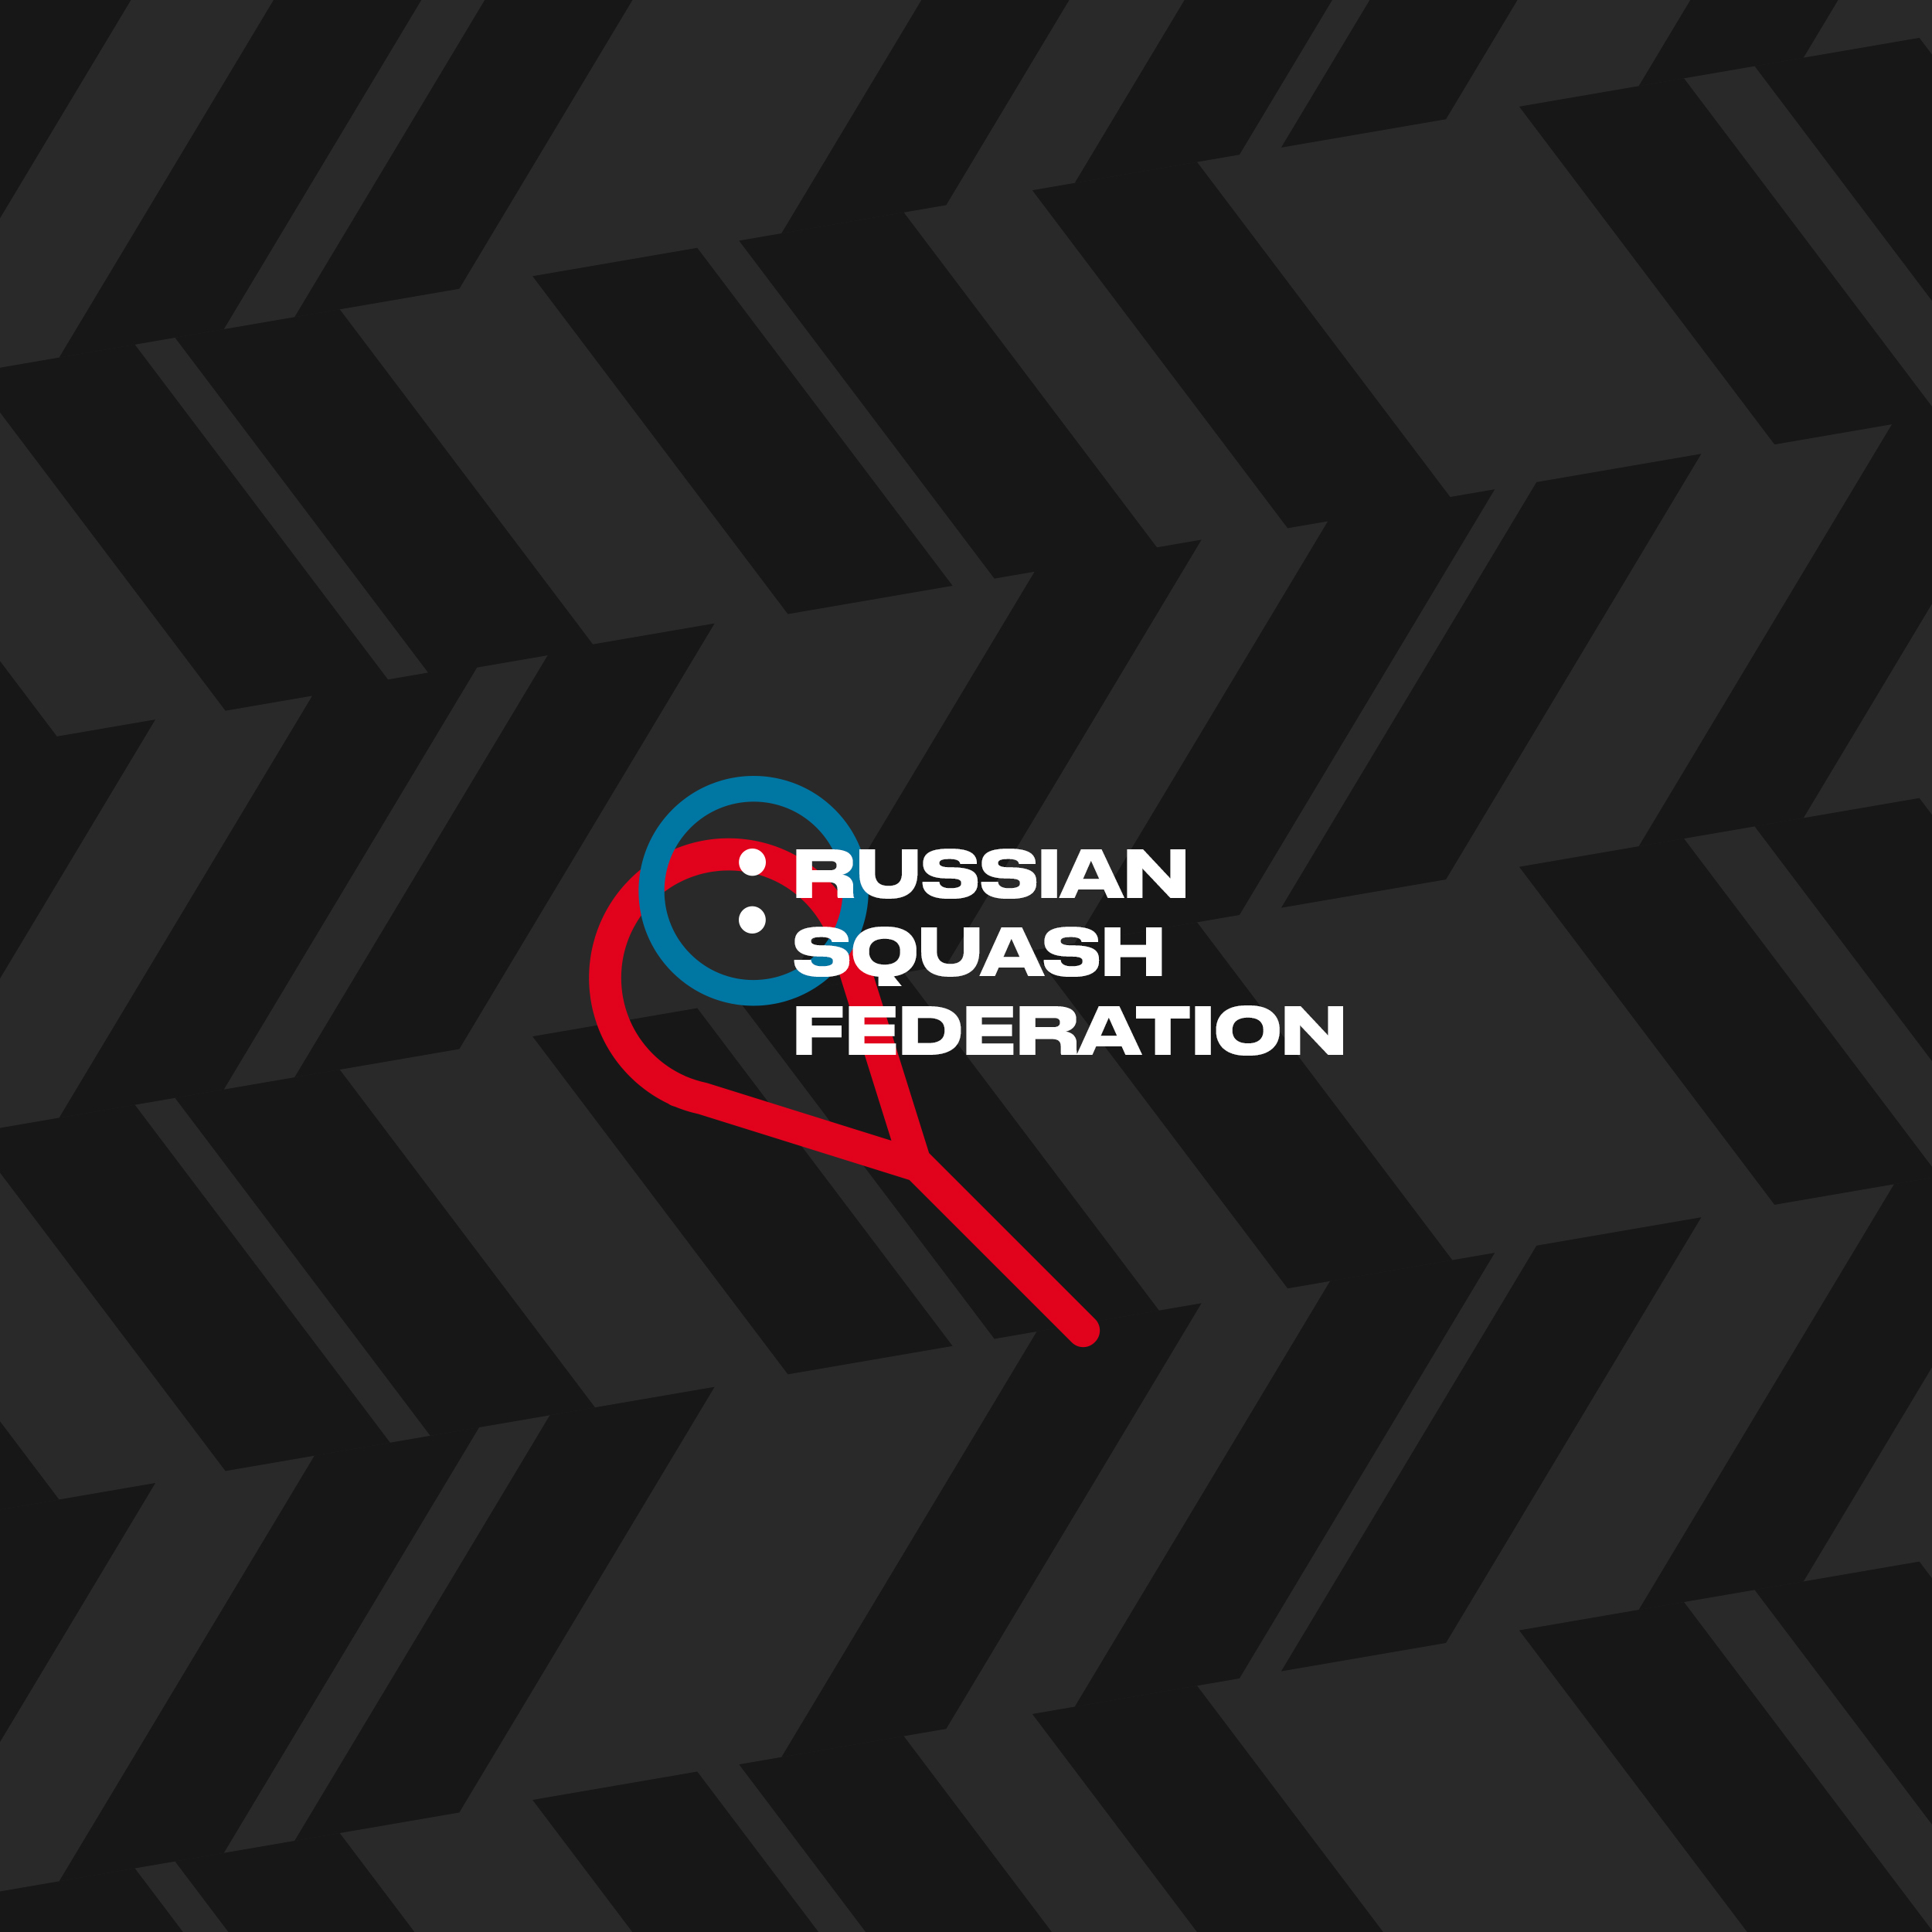 Разработать логотип для Федерации сквоша России фото f_6685f34efa8a3f4f.jpg